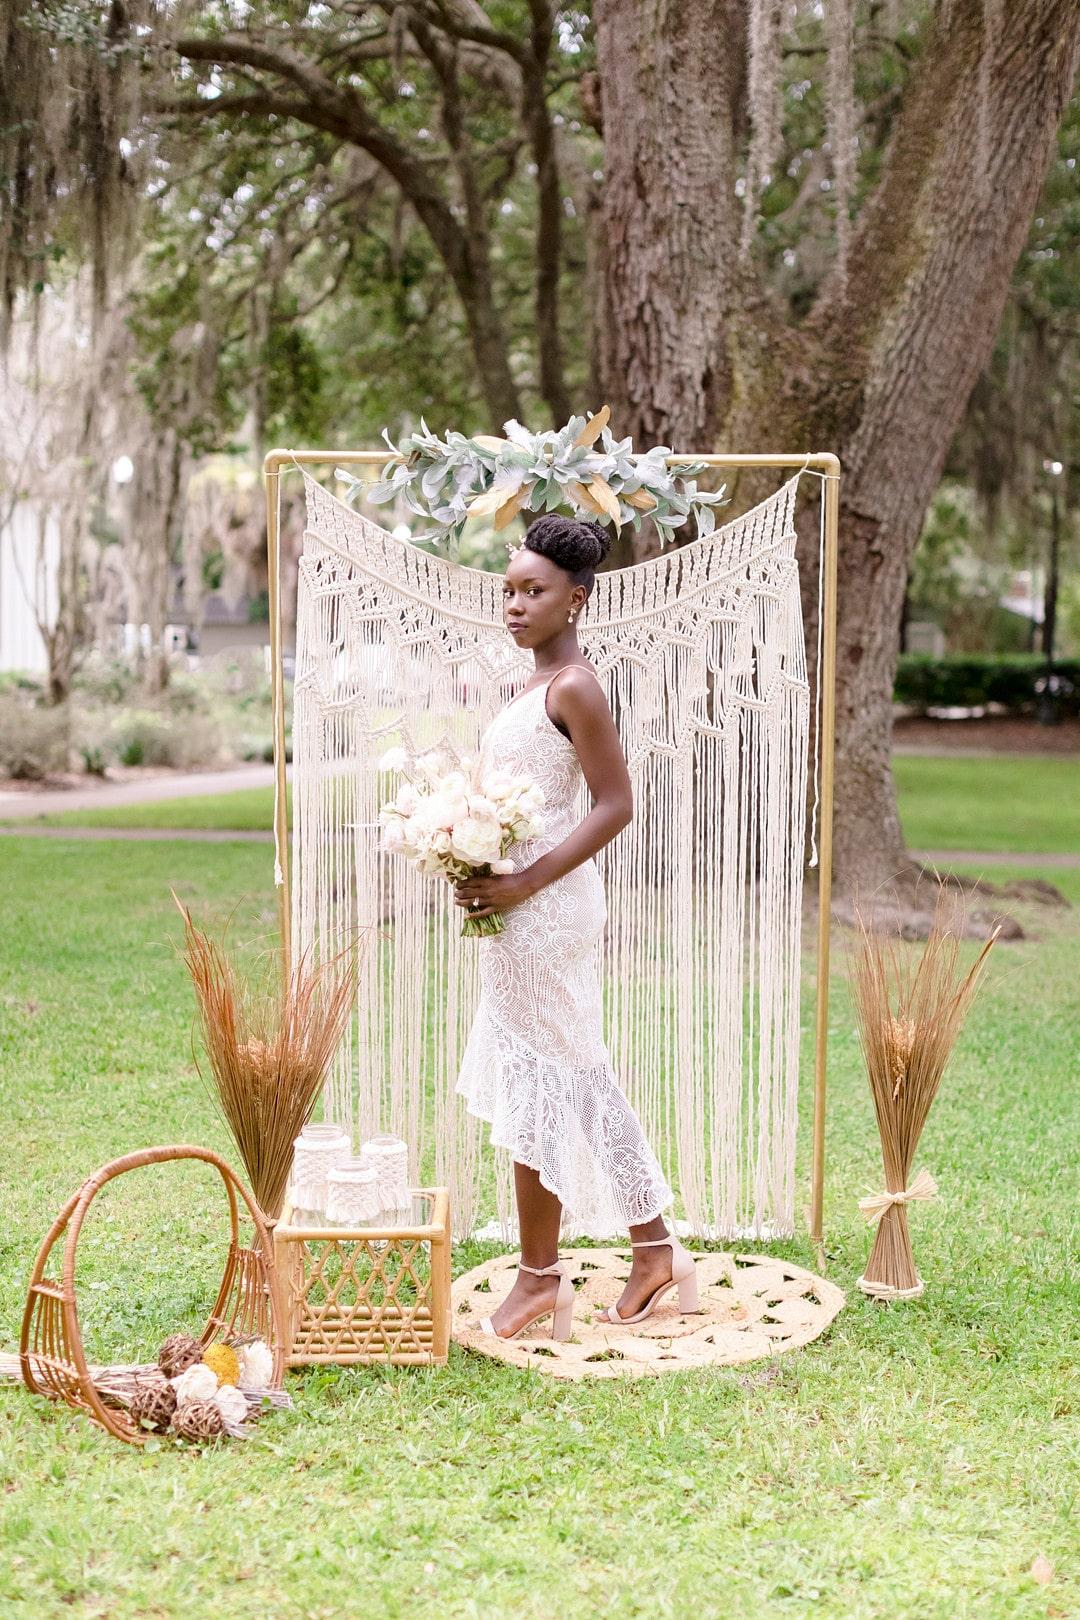 Elegant Boho Wedding Picnic_Susan Dixon Photography, LLC_susan-dixon-012_low